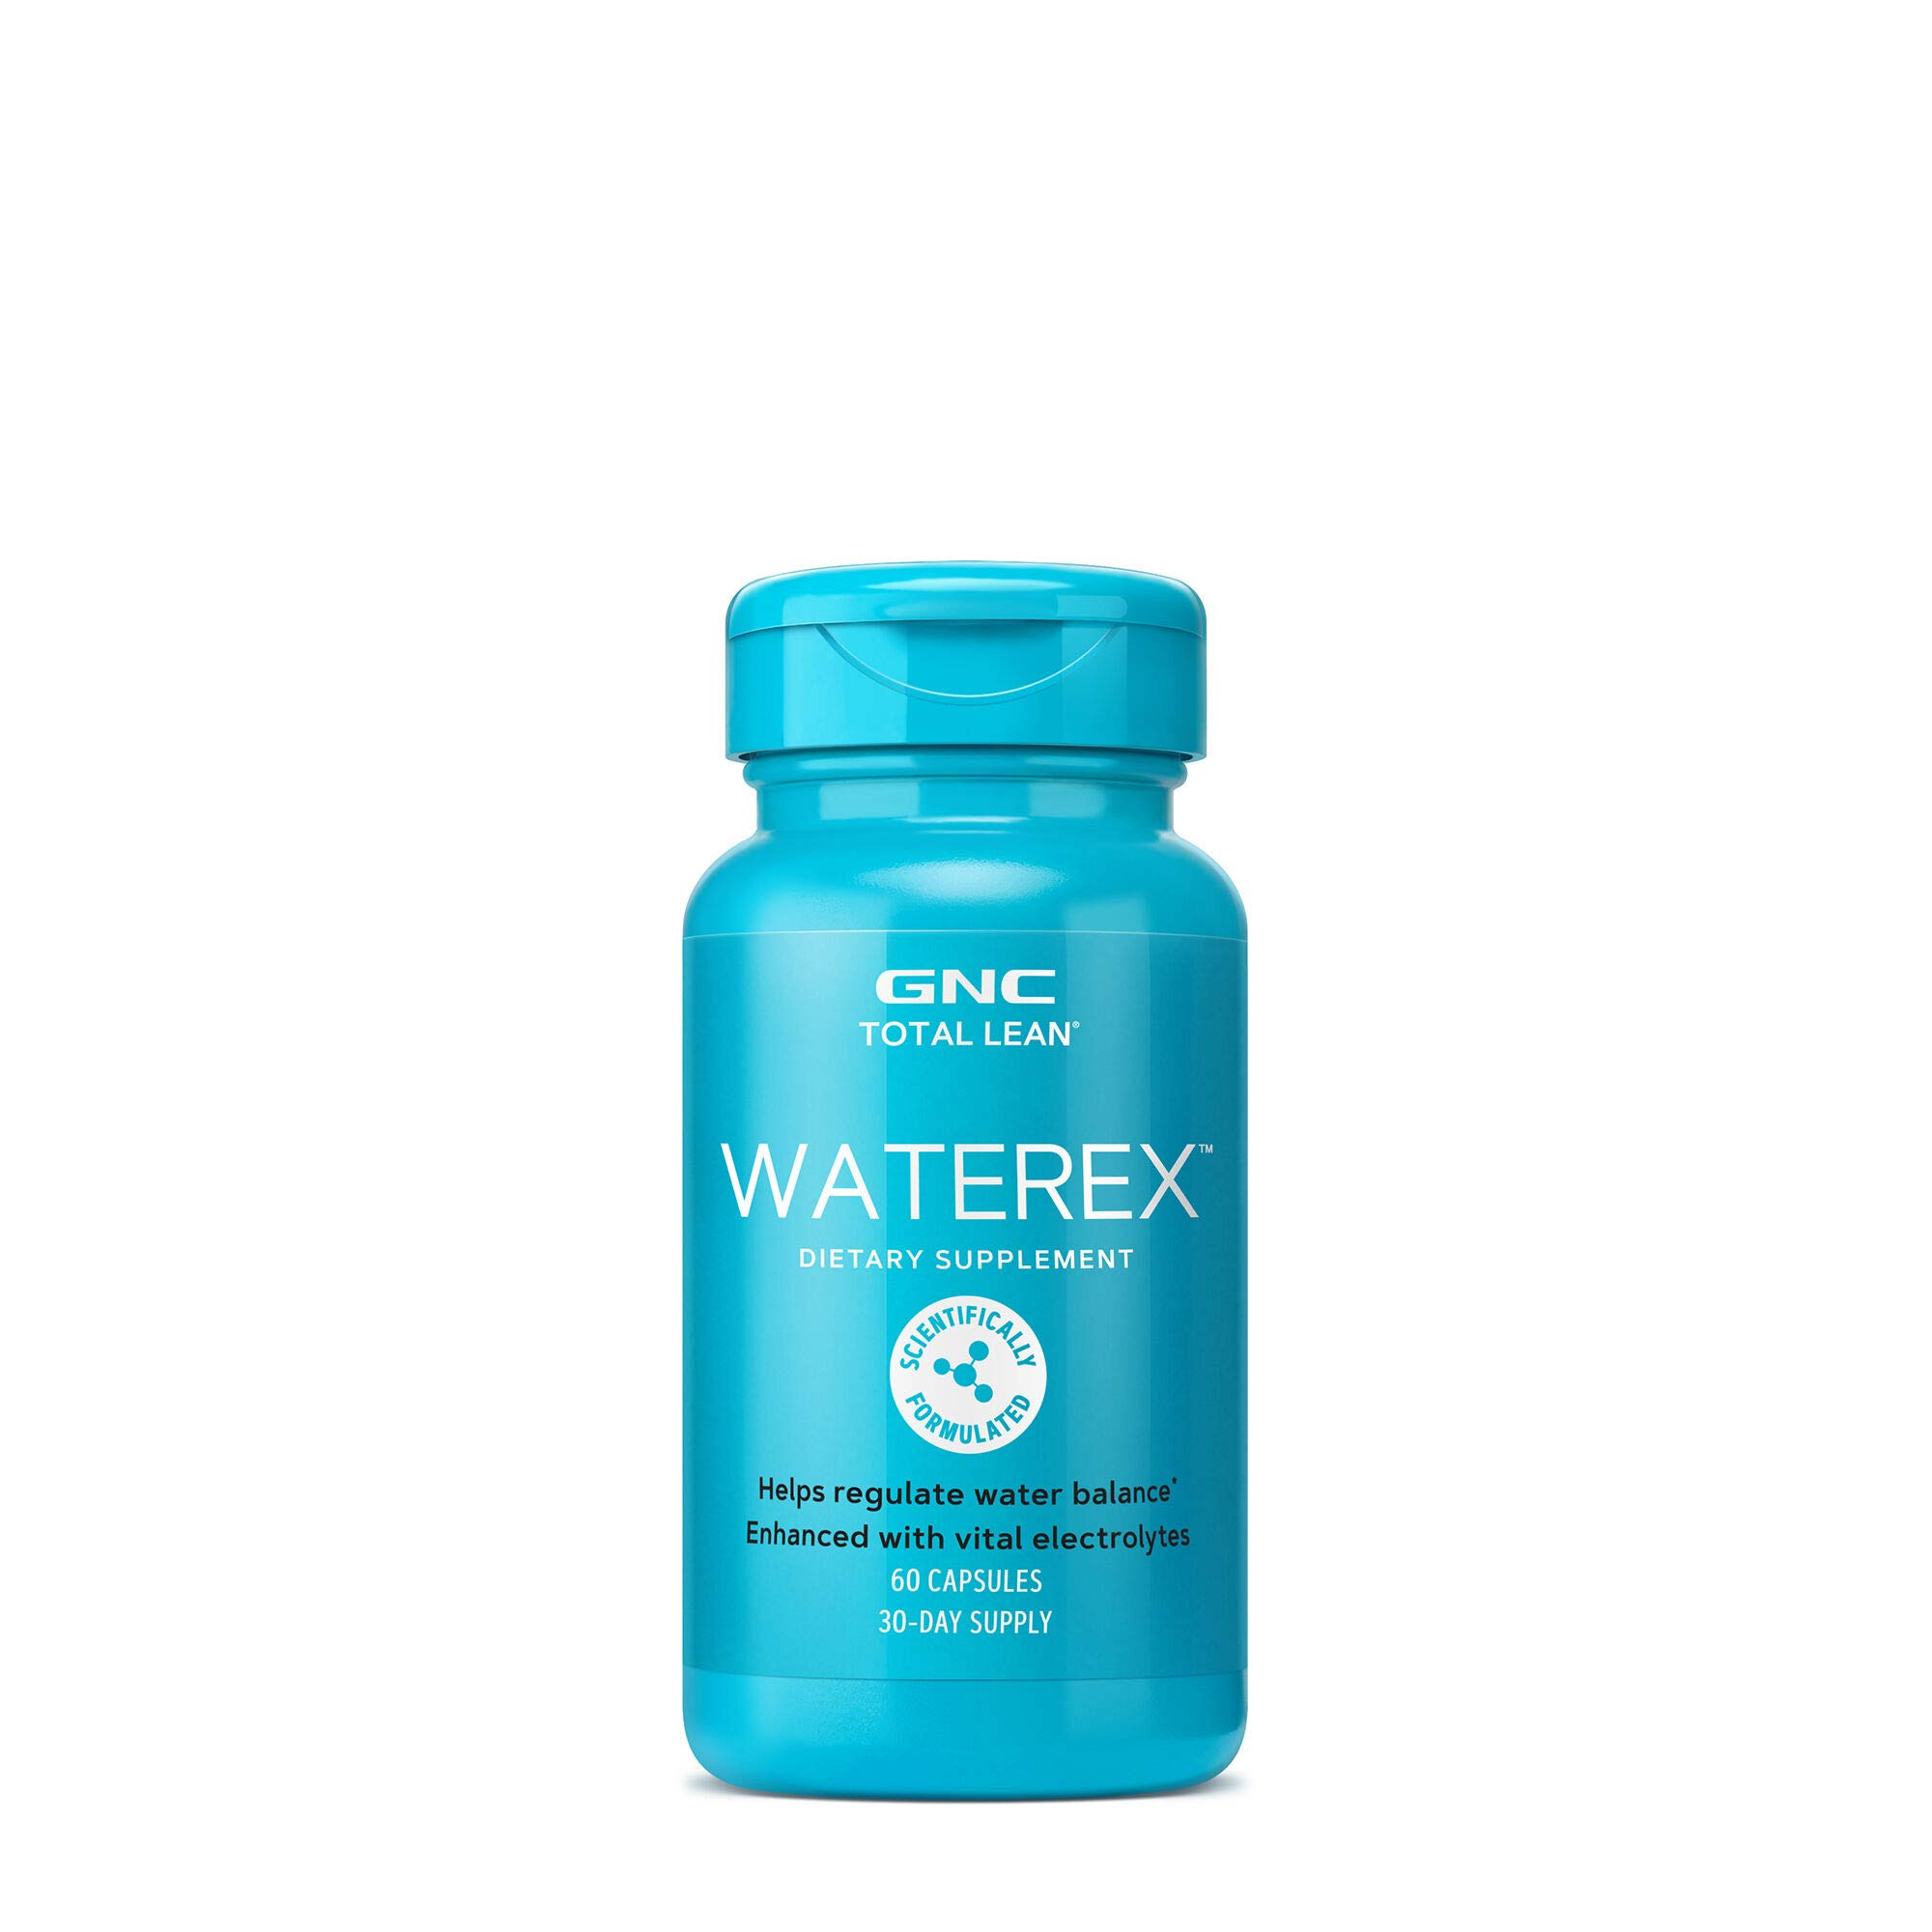 GNC Total Lean Waterex, 60 Capsules, Helps Regulate Water Balance